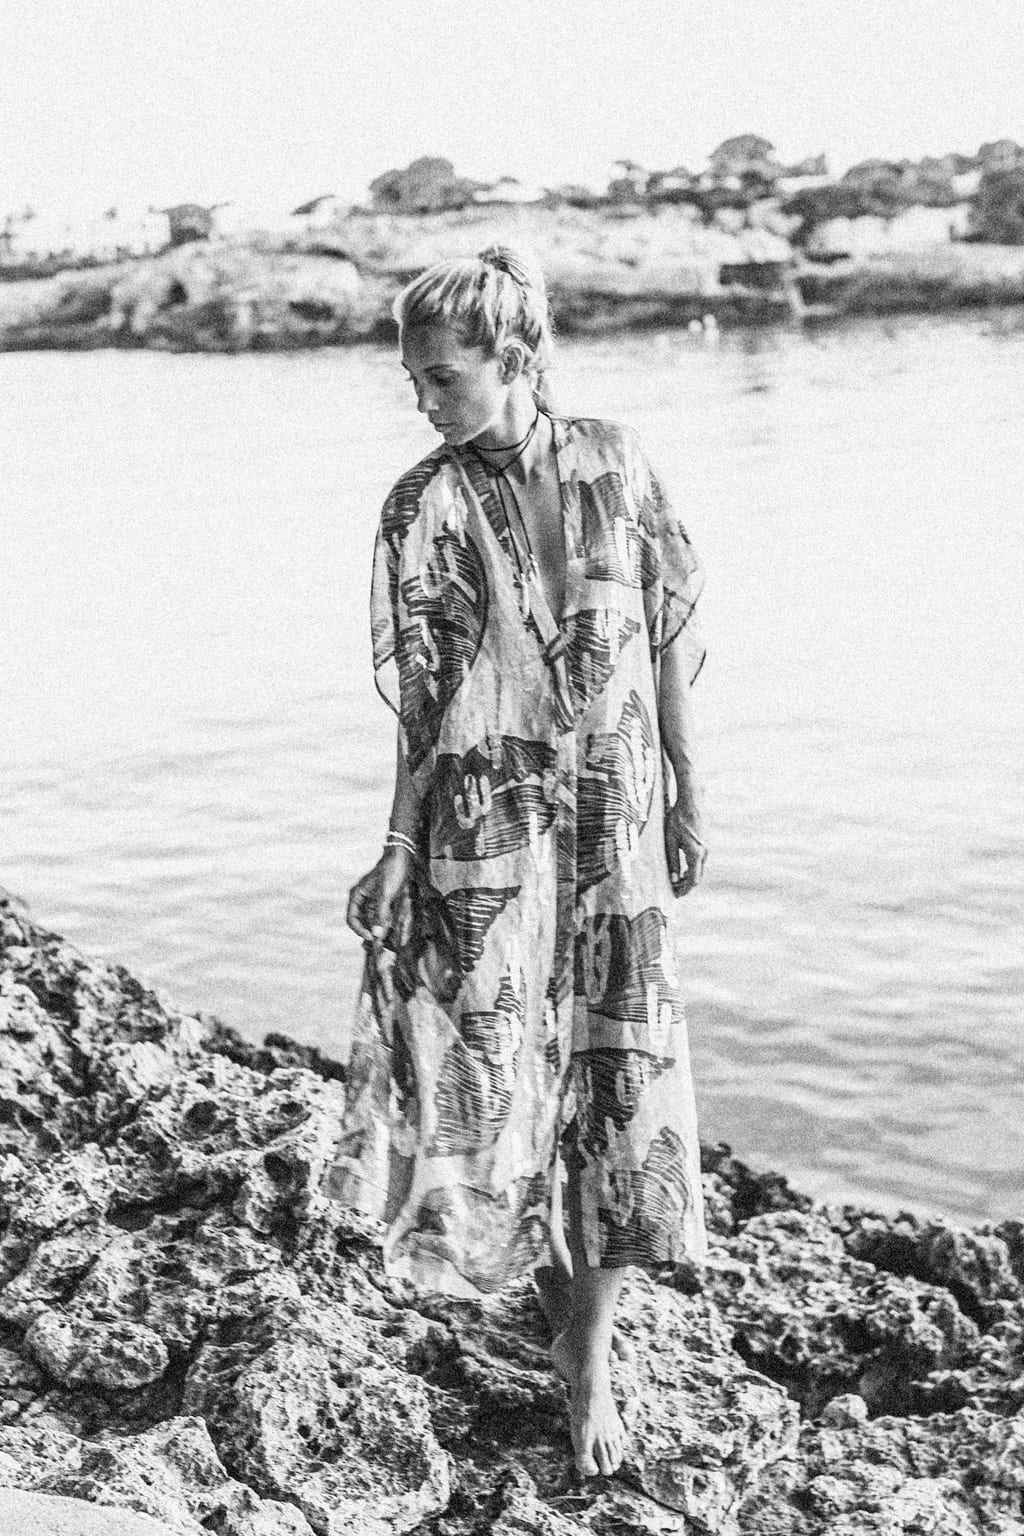 CK-1606-Mallorca-Island-Spain-Luxury-Holiday-Blogger-Beach-Outfit-Style-Fashion-Baleares-1228